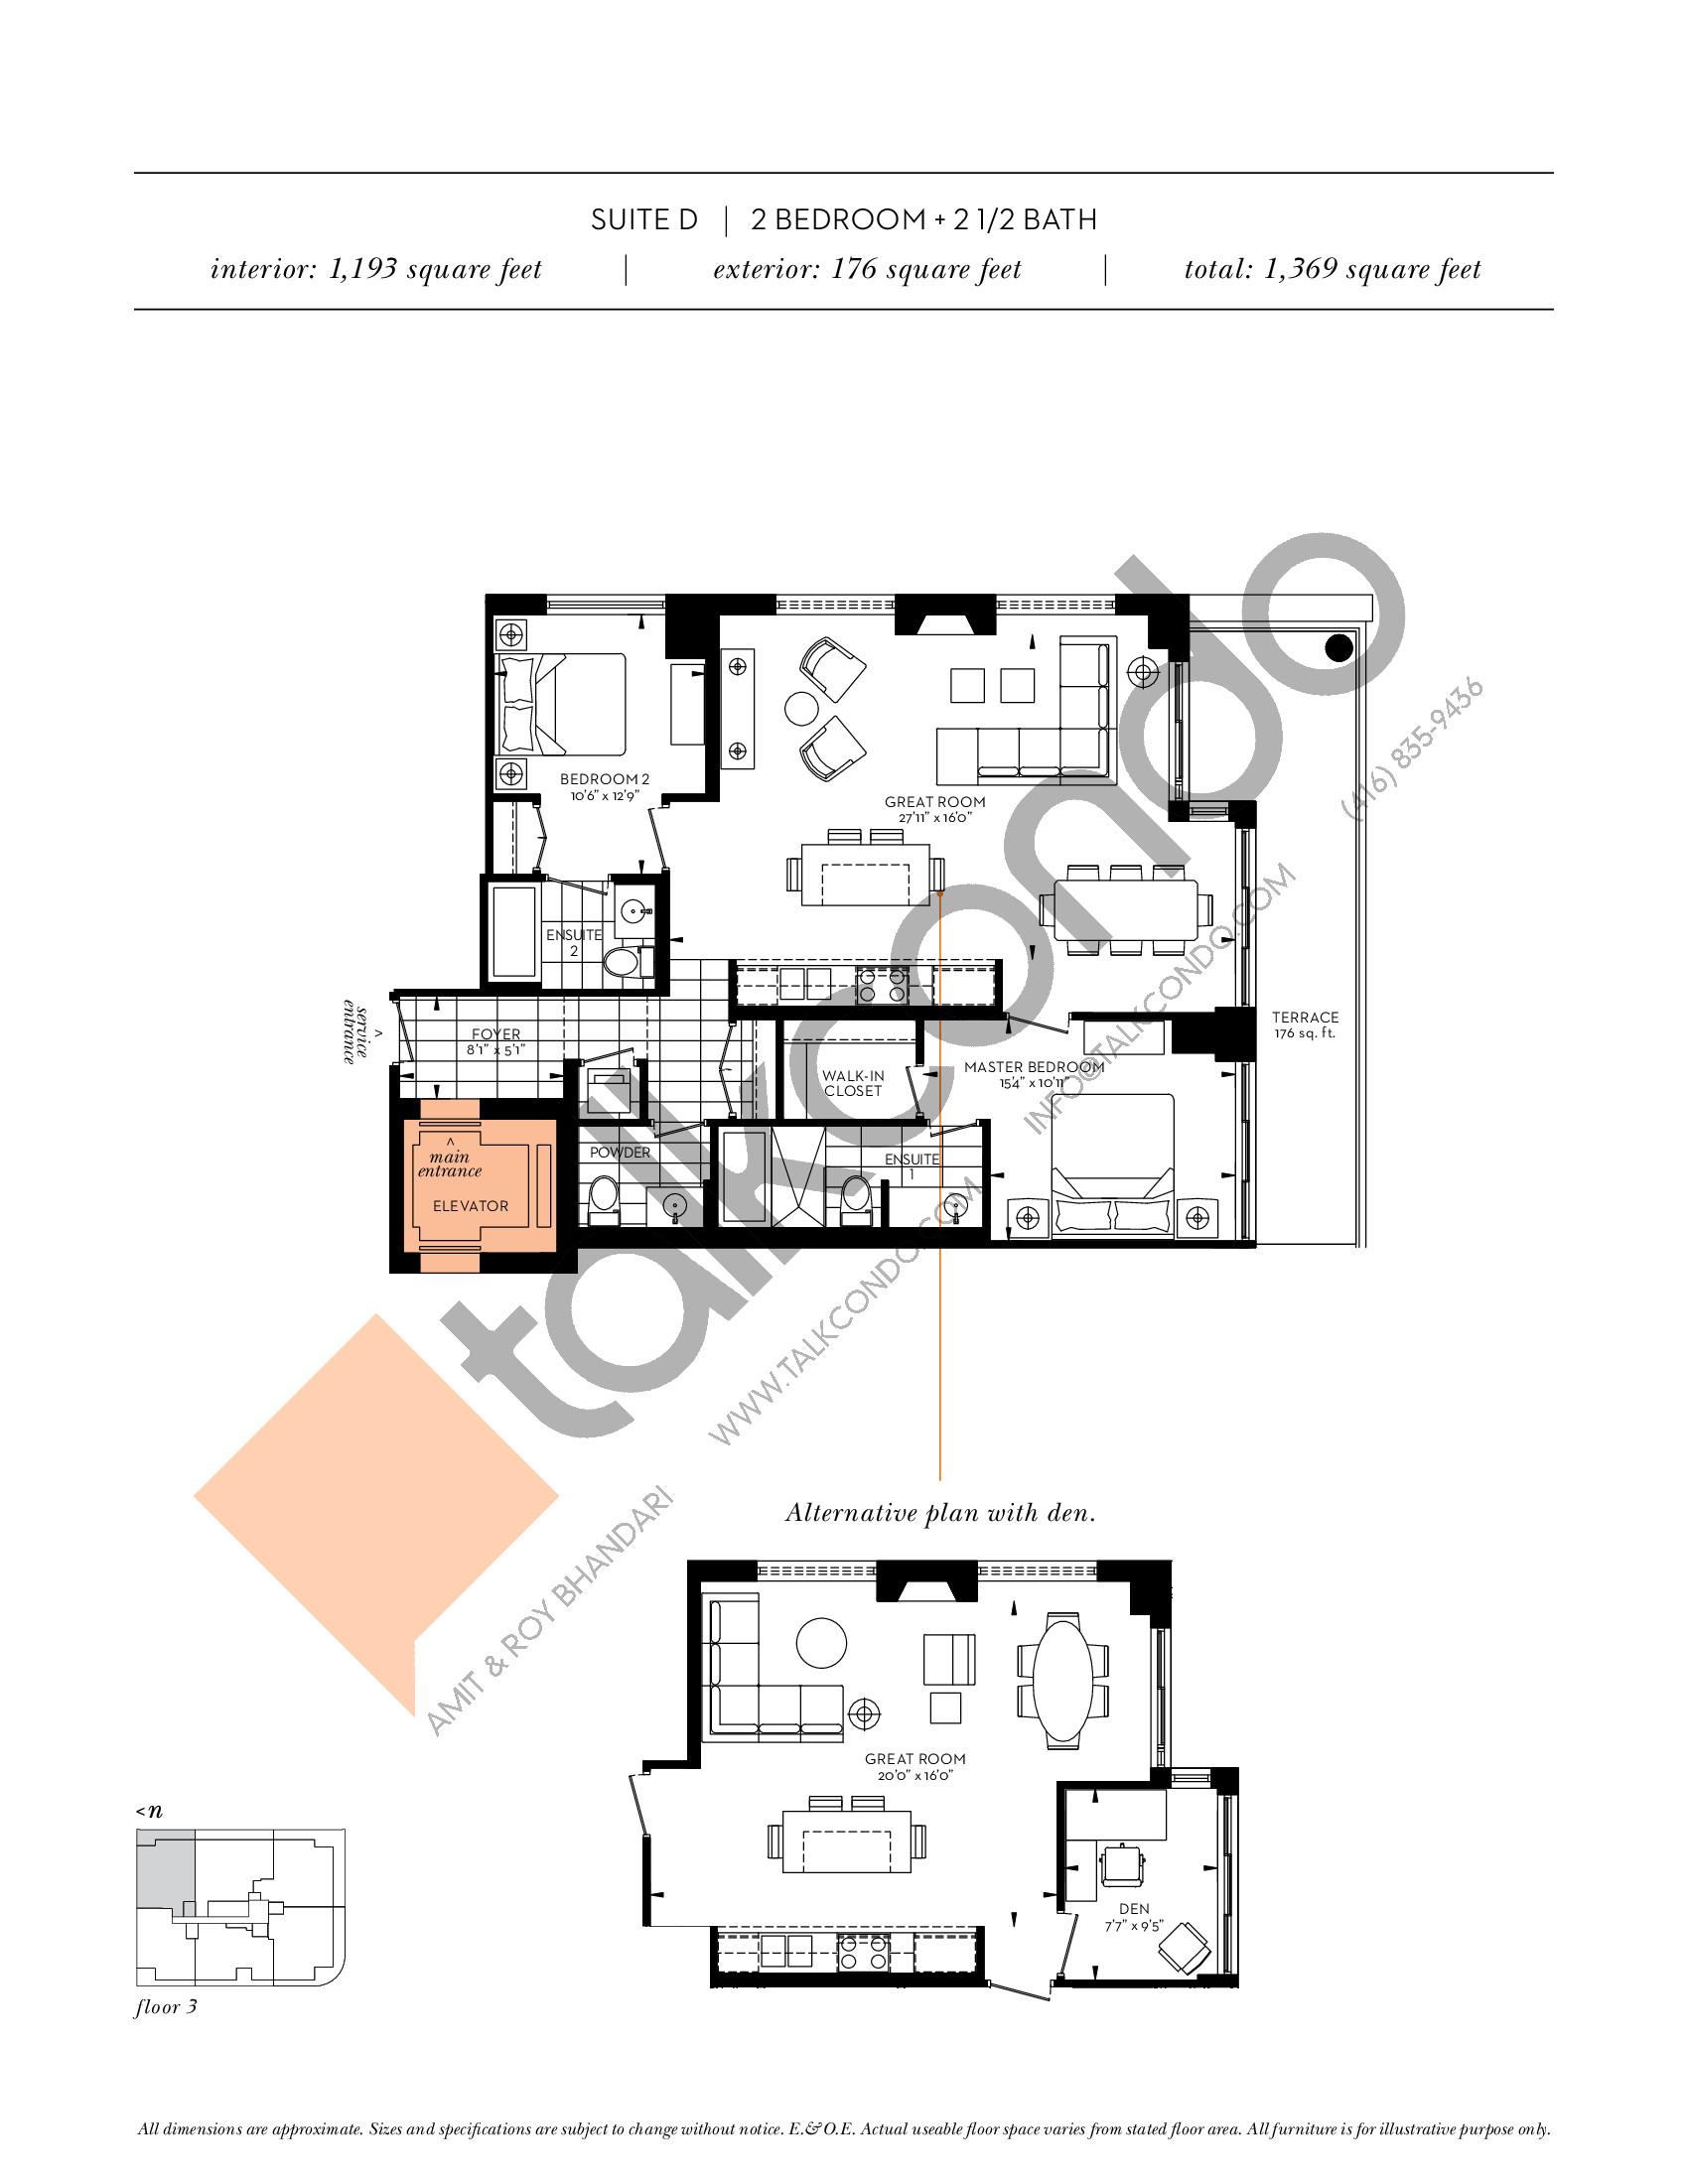 Suite D Floor Plan at The Davies - 1193 sq.ft